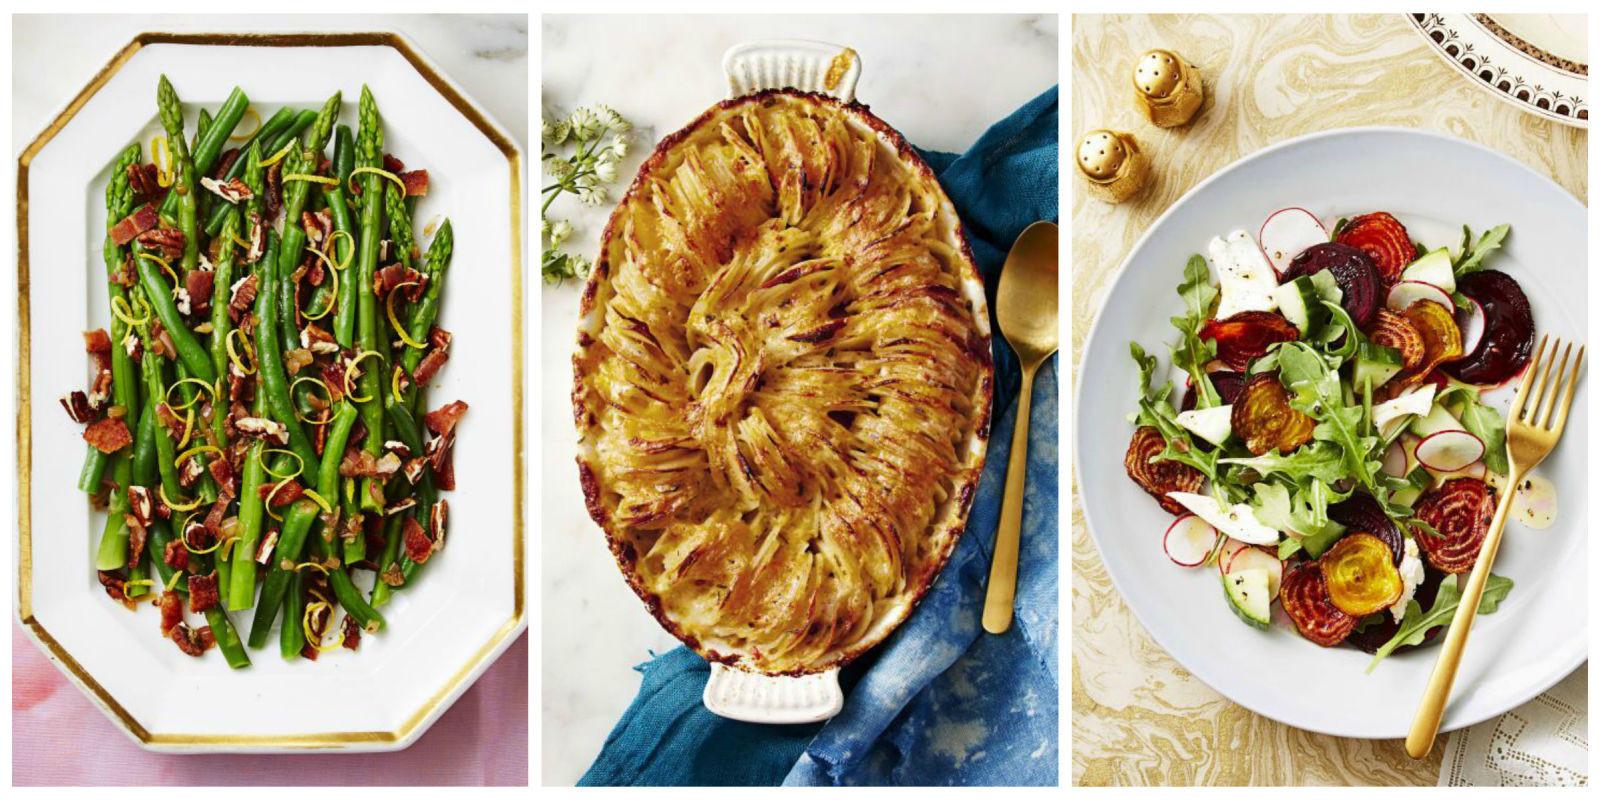 Side Dishes For Easter Dinner Ideas  20 Best Easter Side Dishes Easy Recipes for Easter